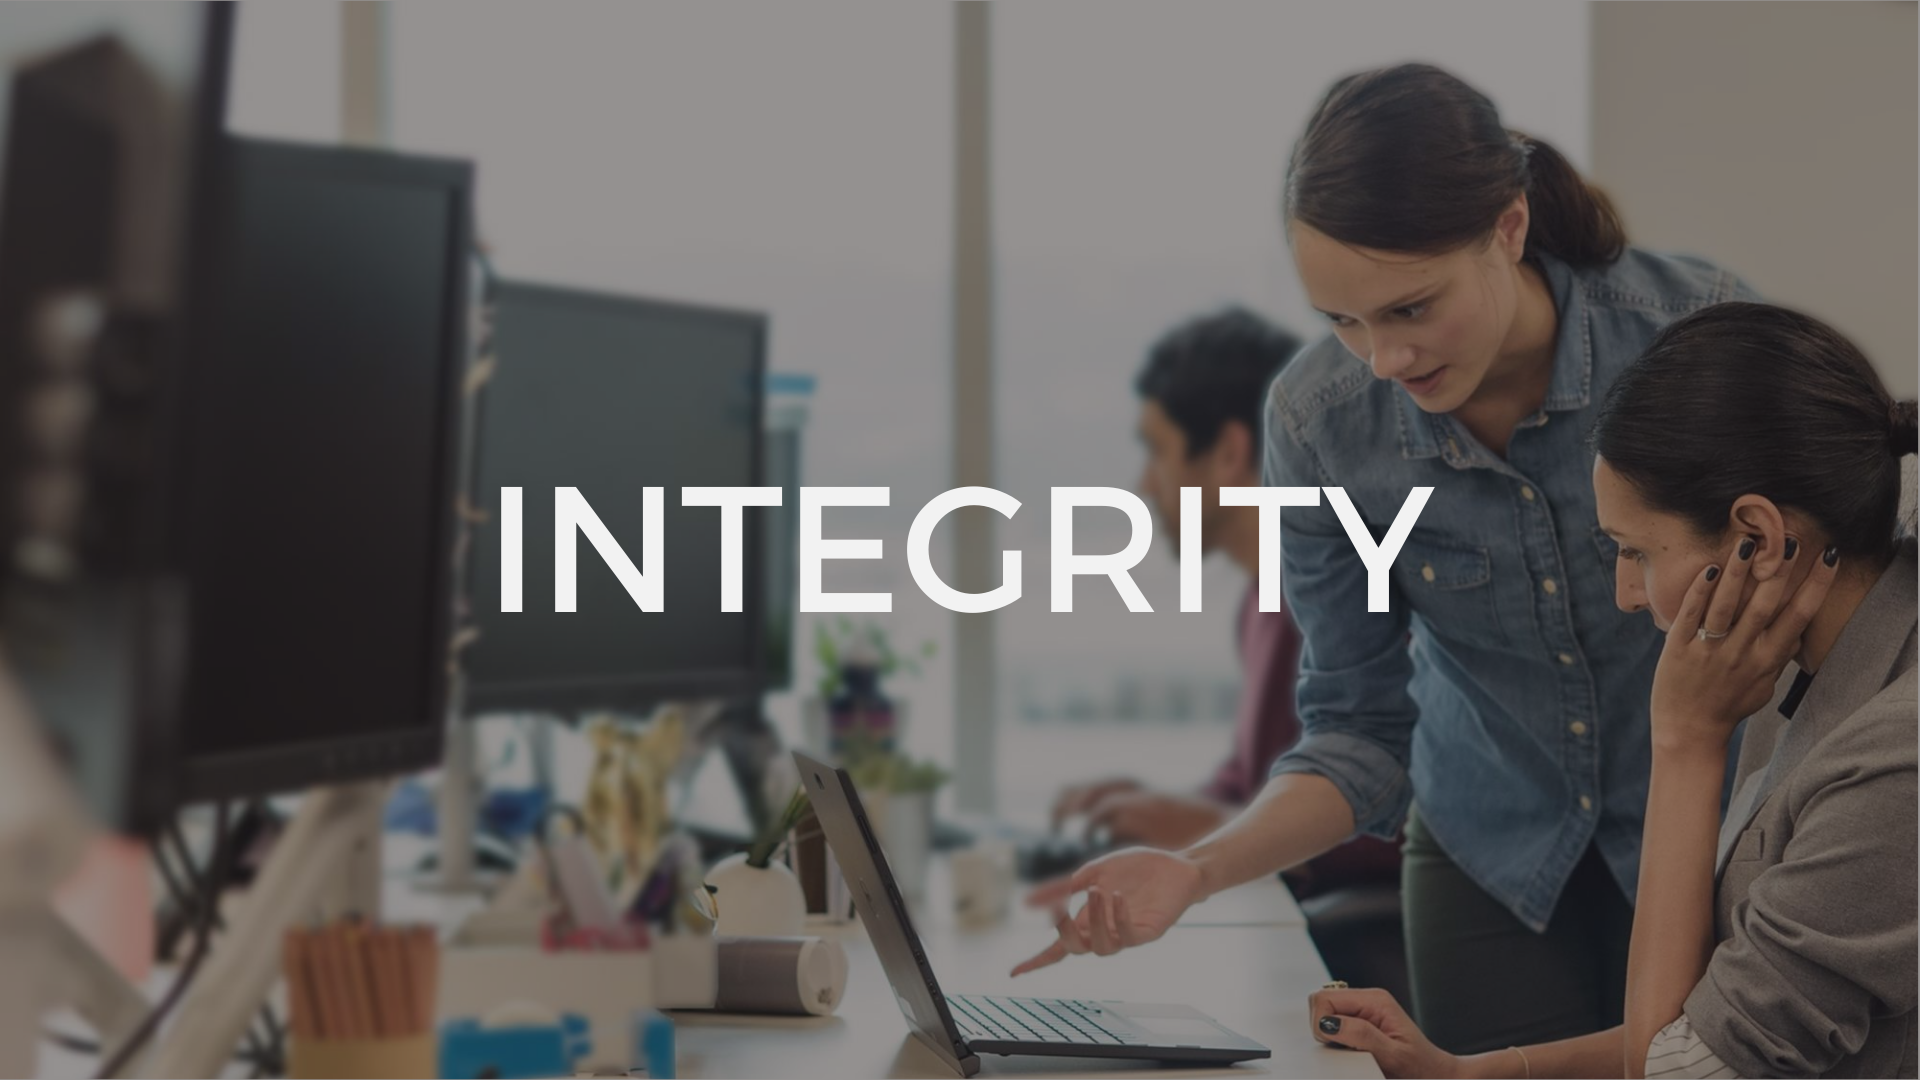 Projectum value integrity